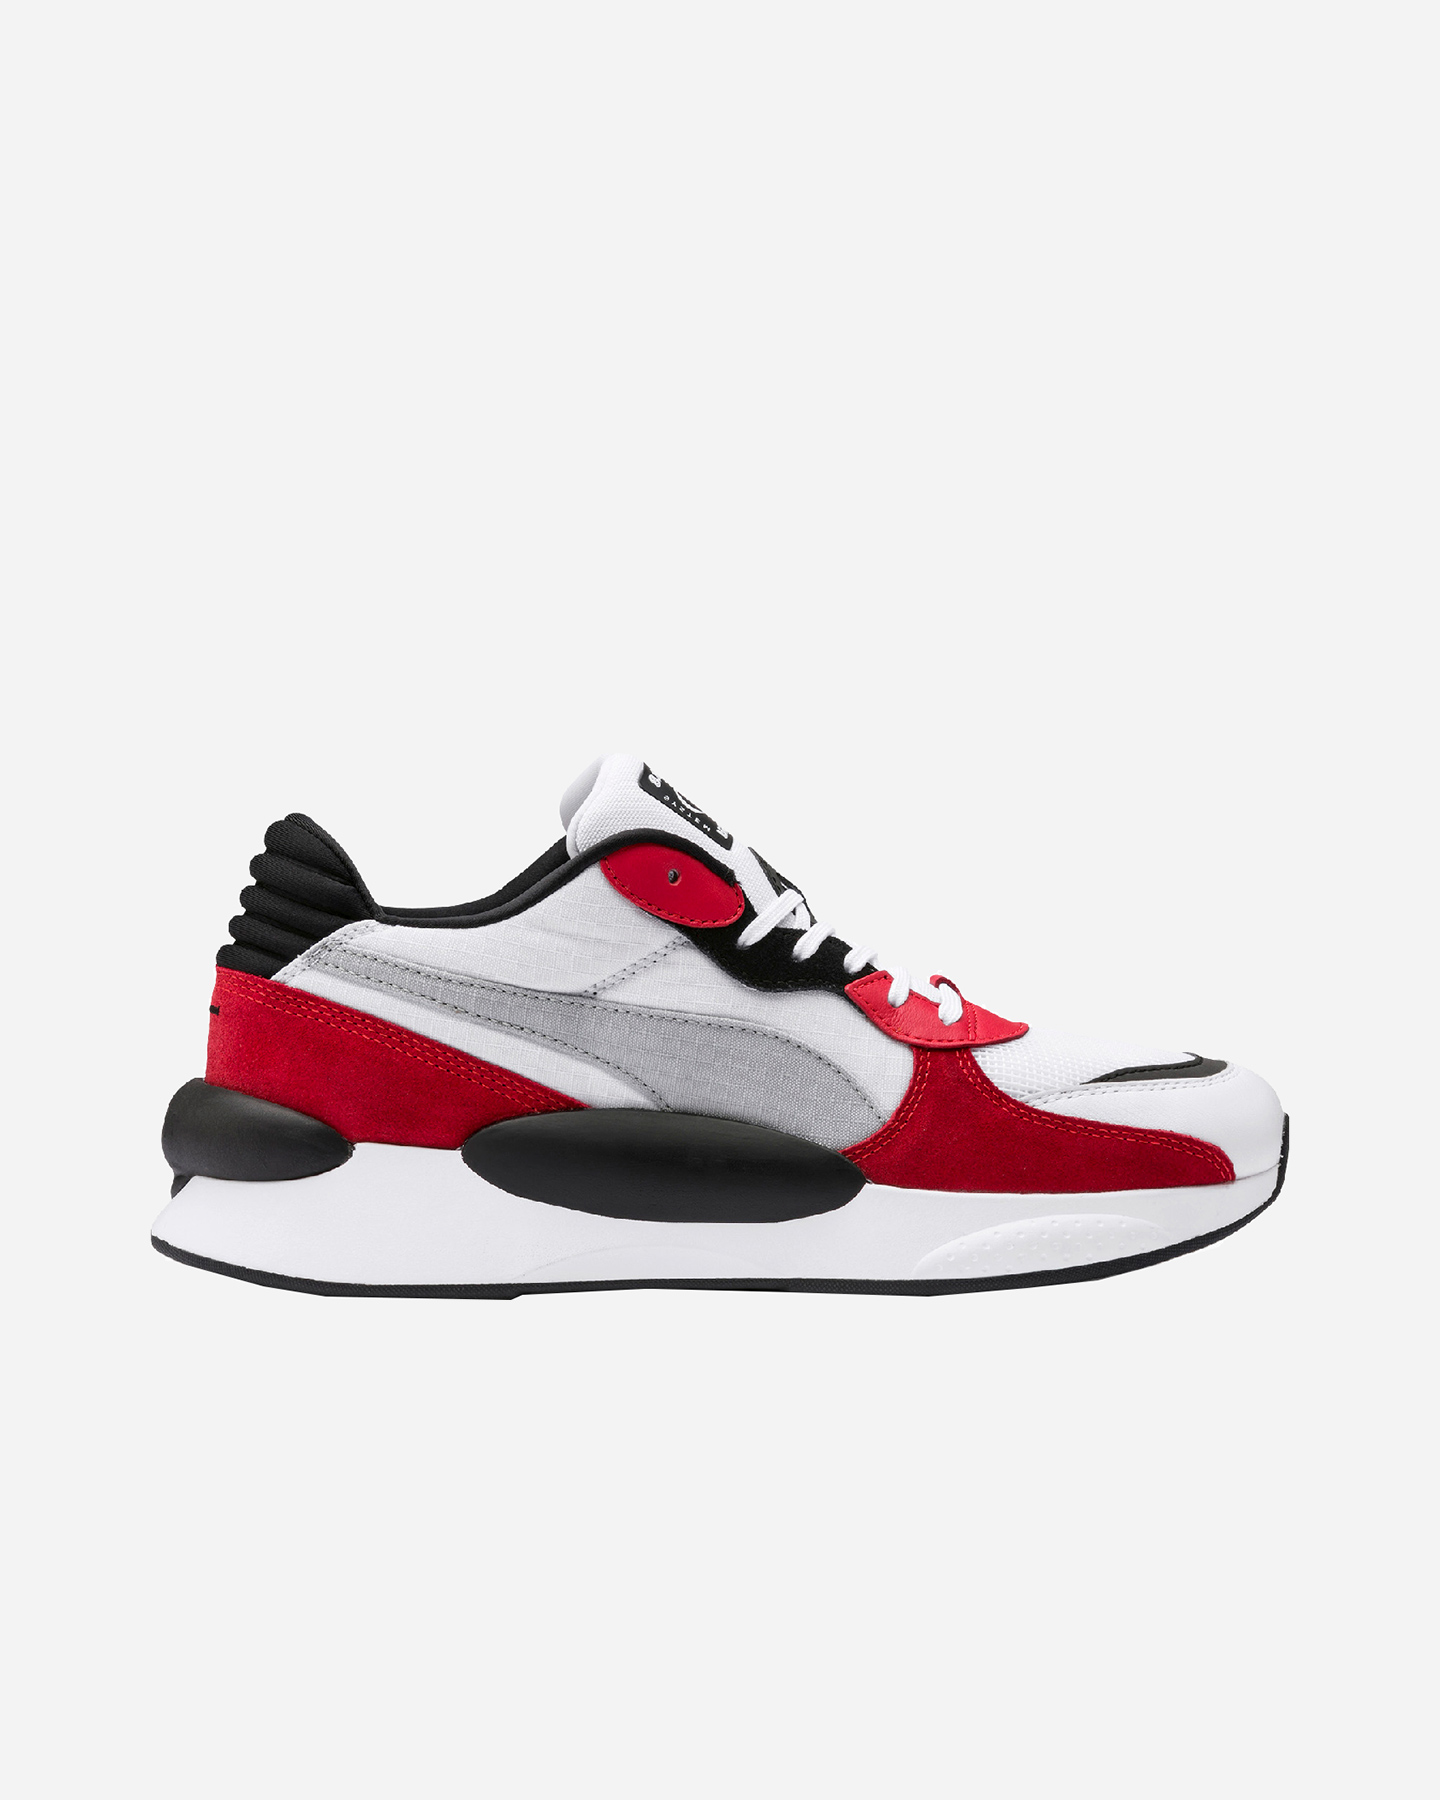 scarpe uomo puma running